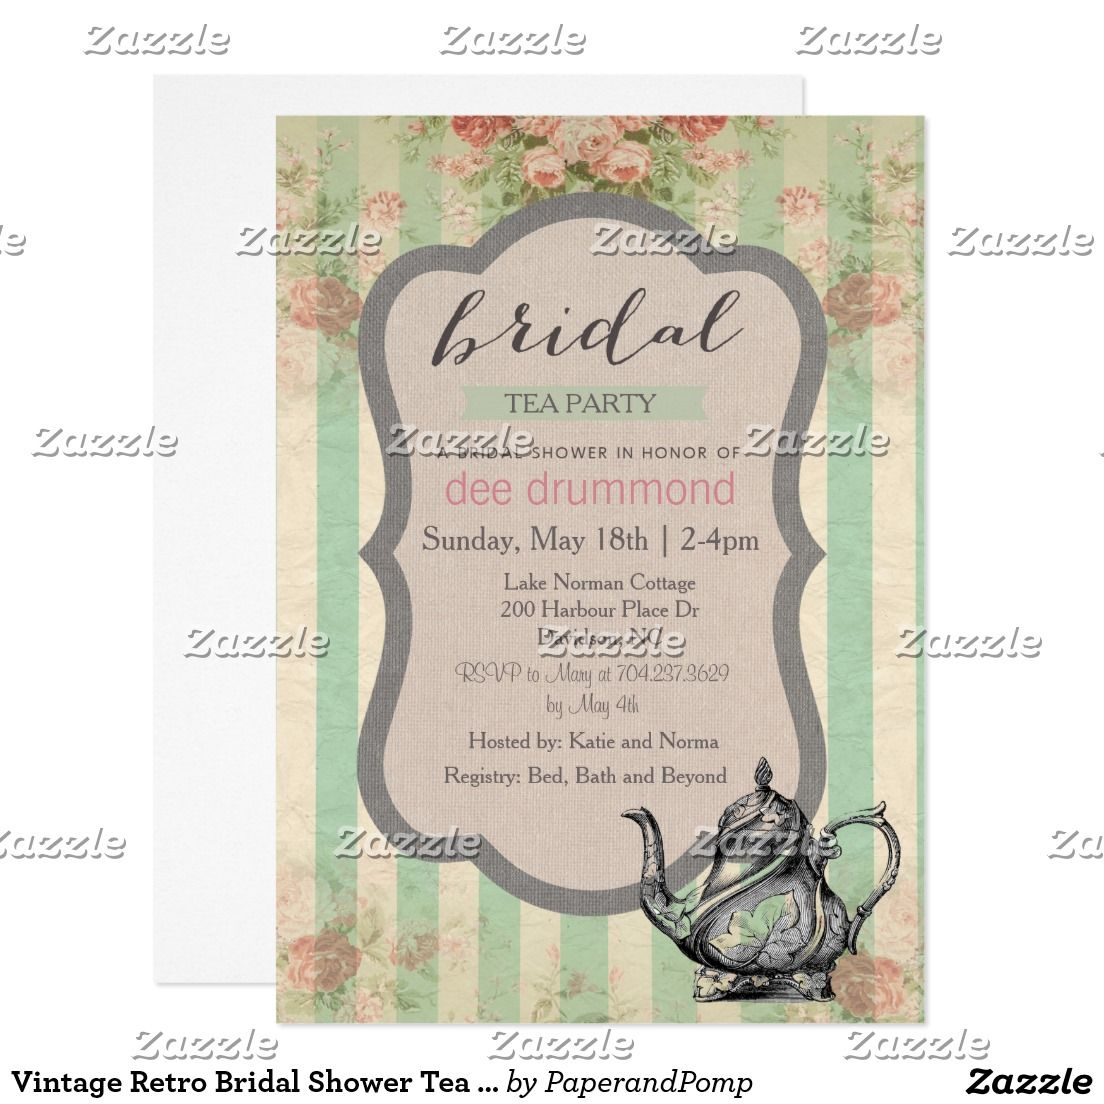 Vintage Retro Bridal Shower Tea Party Invitation | Tea Party ...